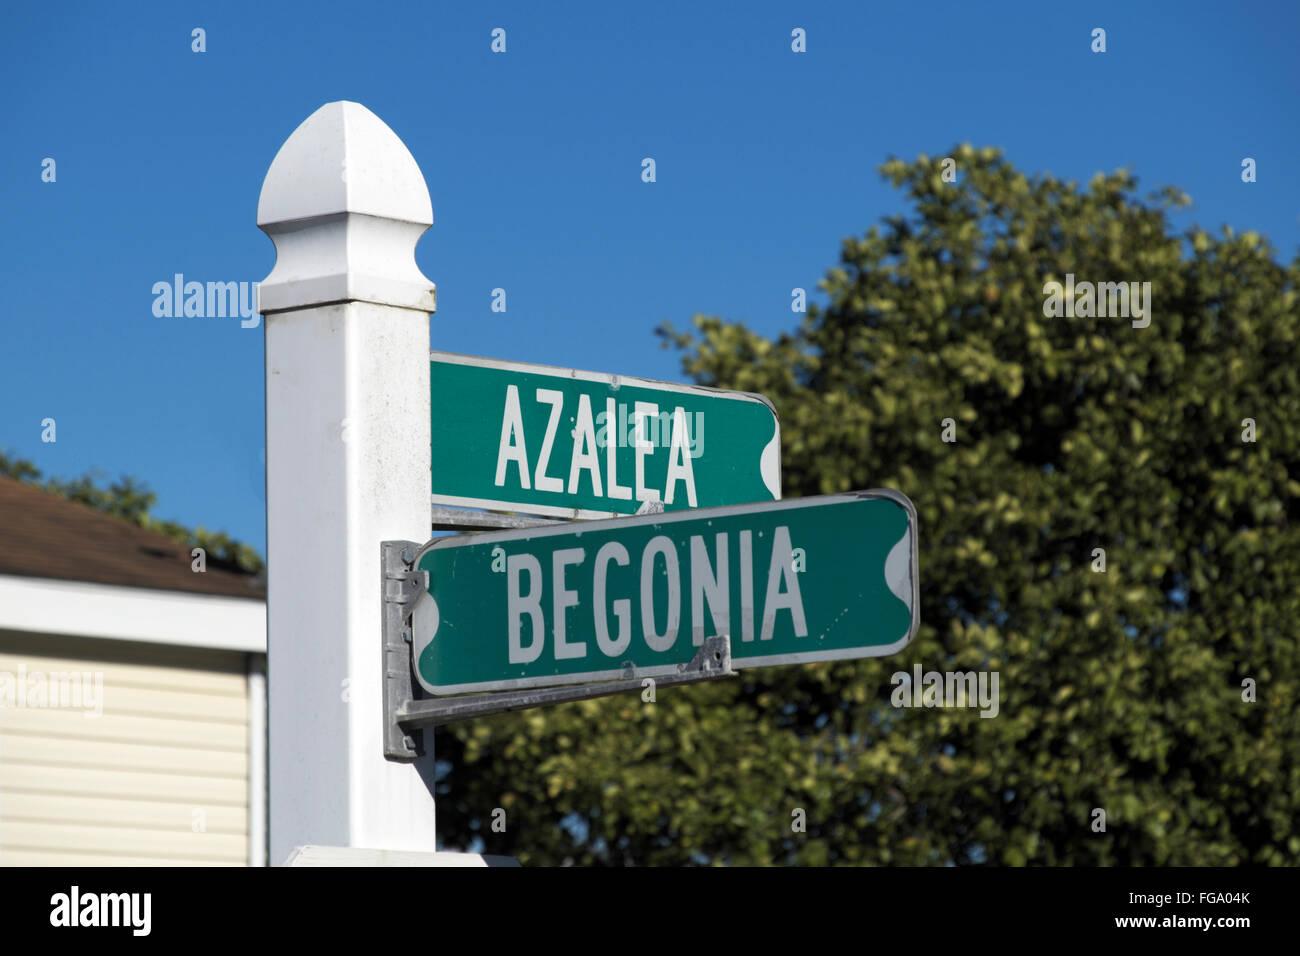 Corner street sign in an Alamo, Texas residential neighborhood. Stock Photo